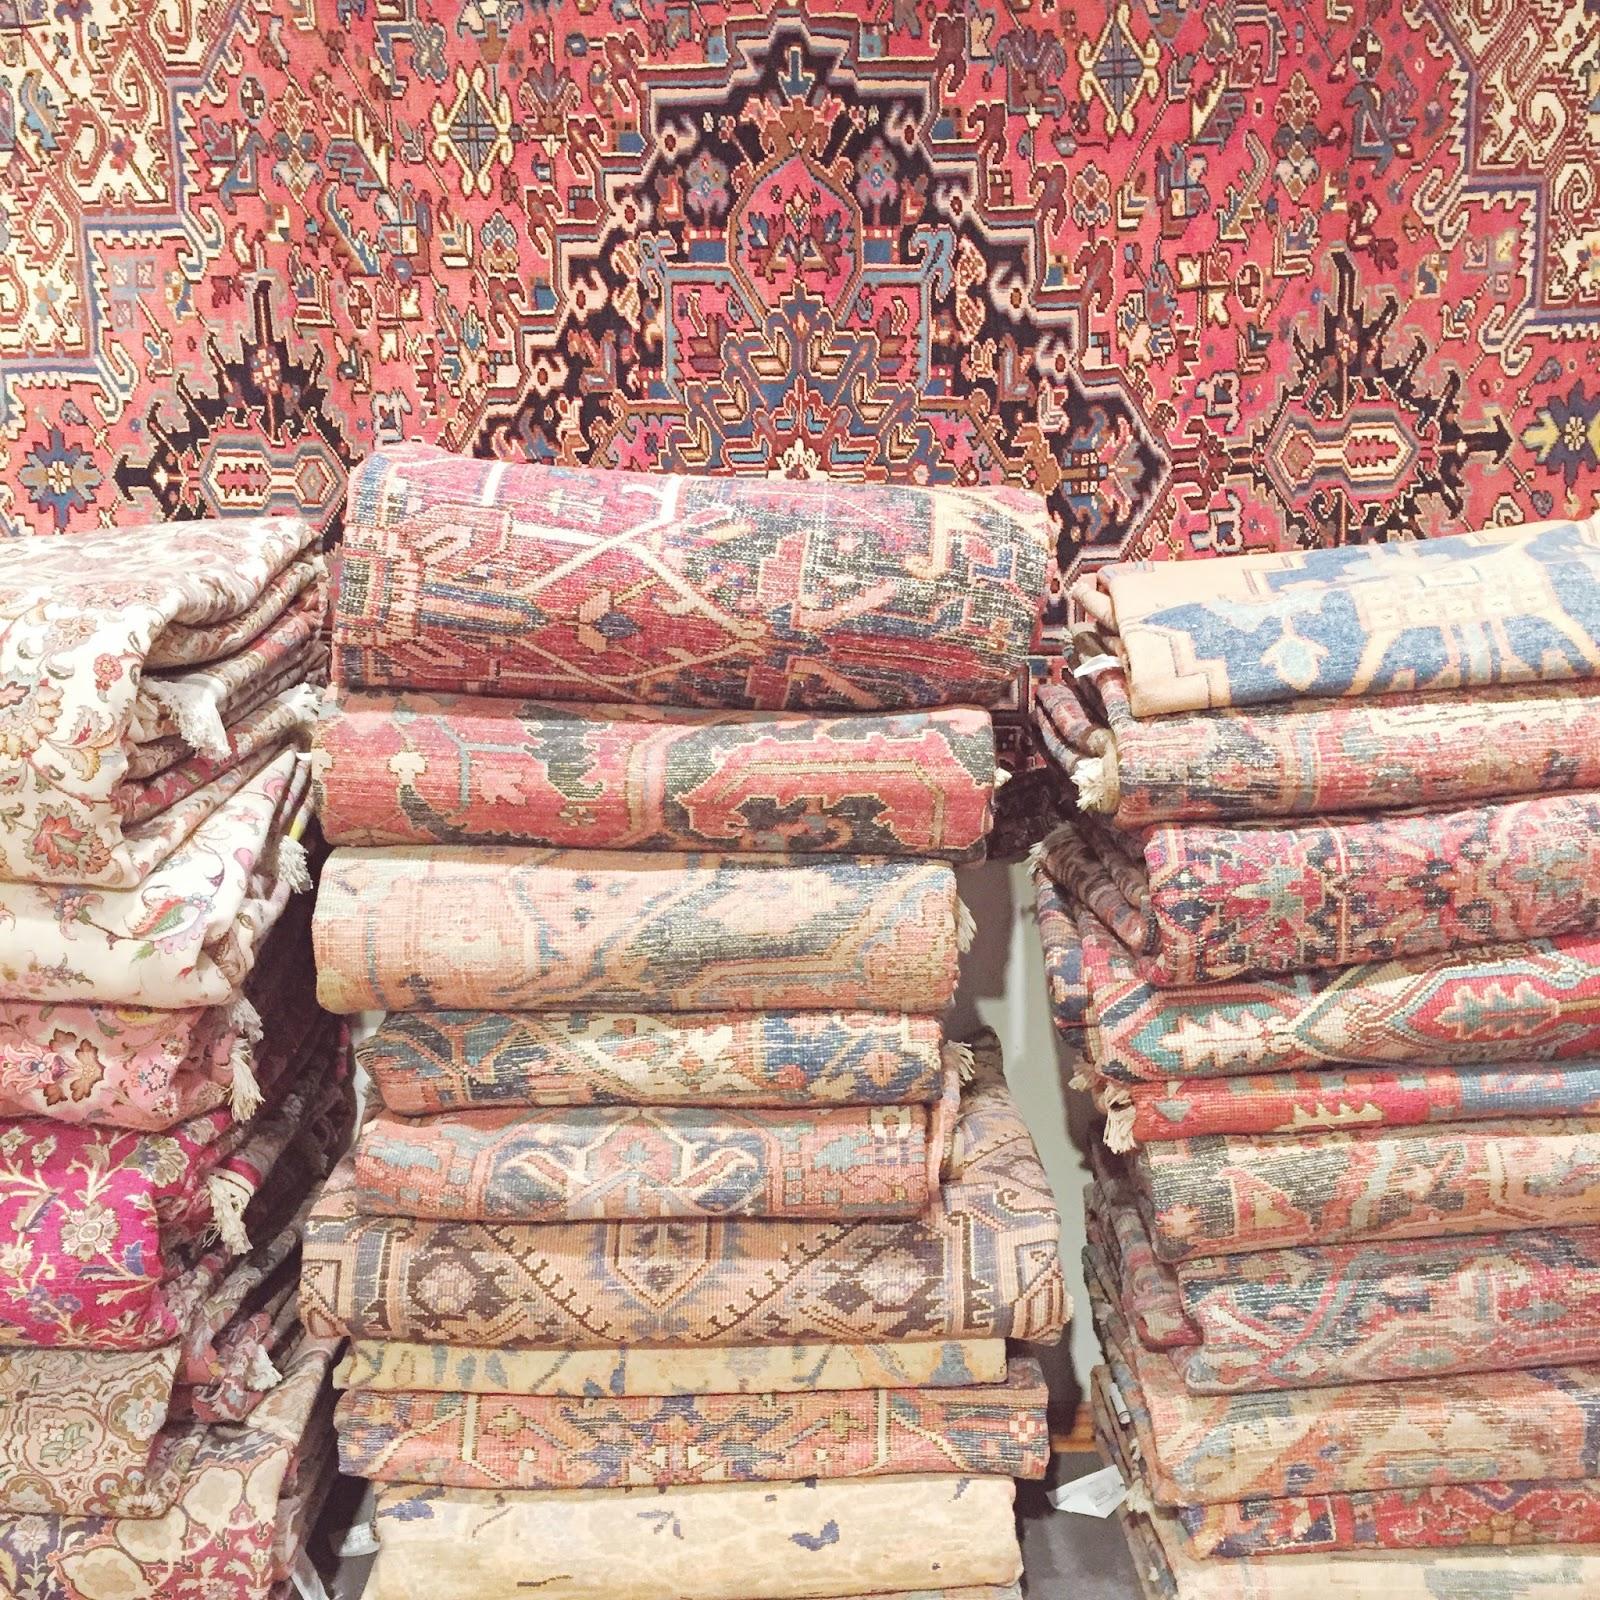 Dallas_market_Feizy_antique_turkish_rugs.JPG